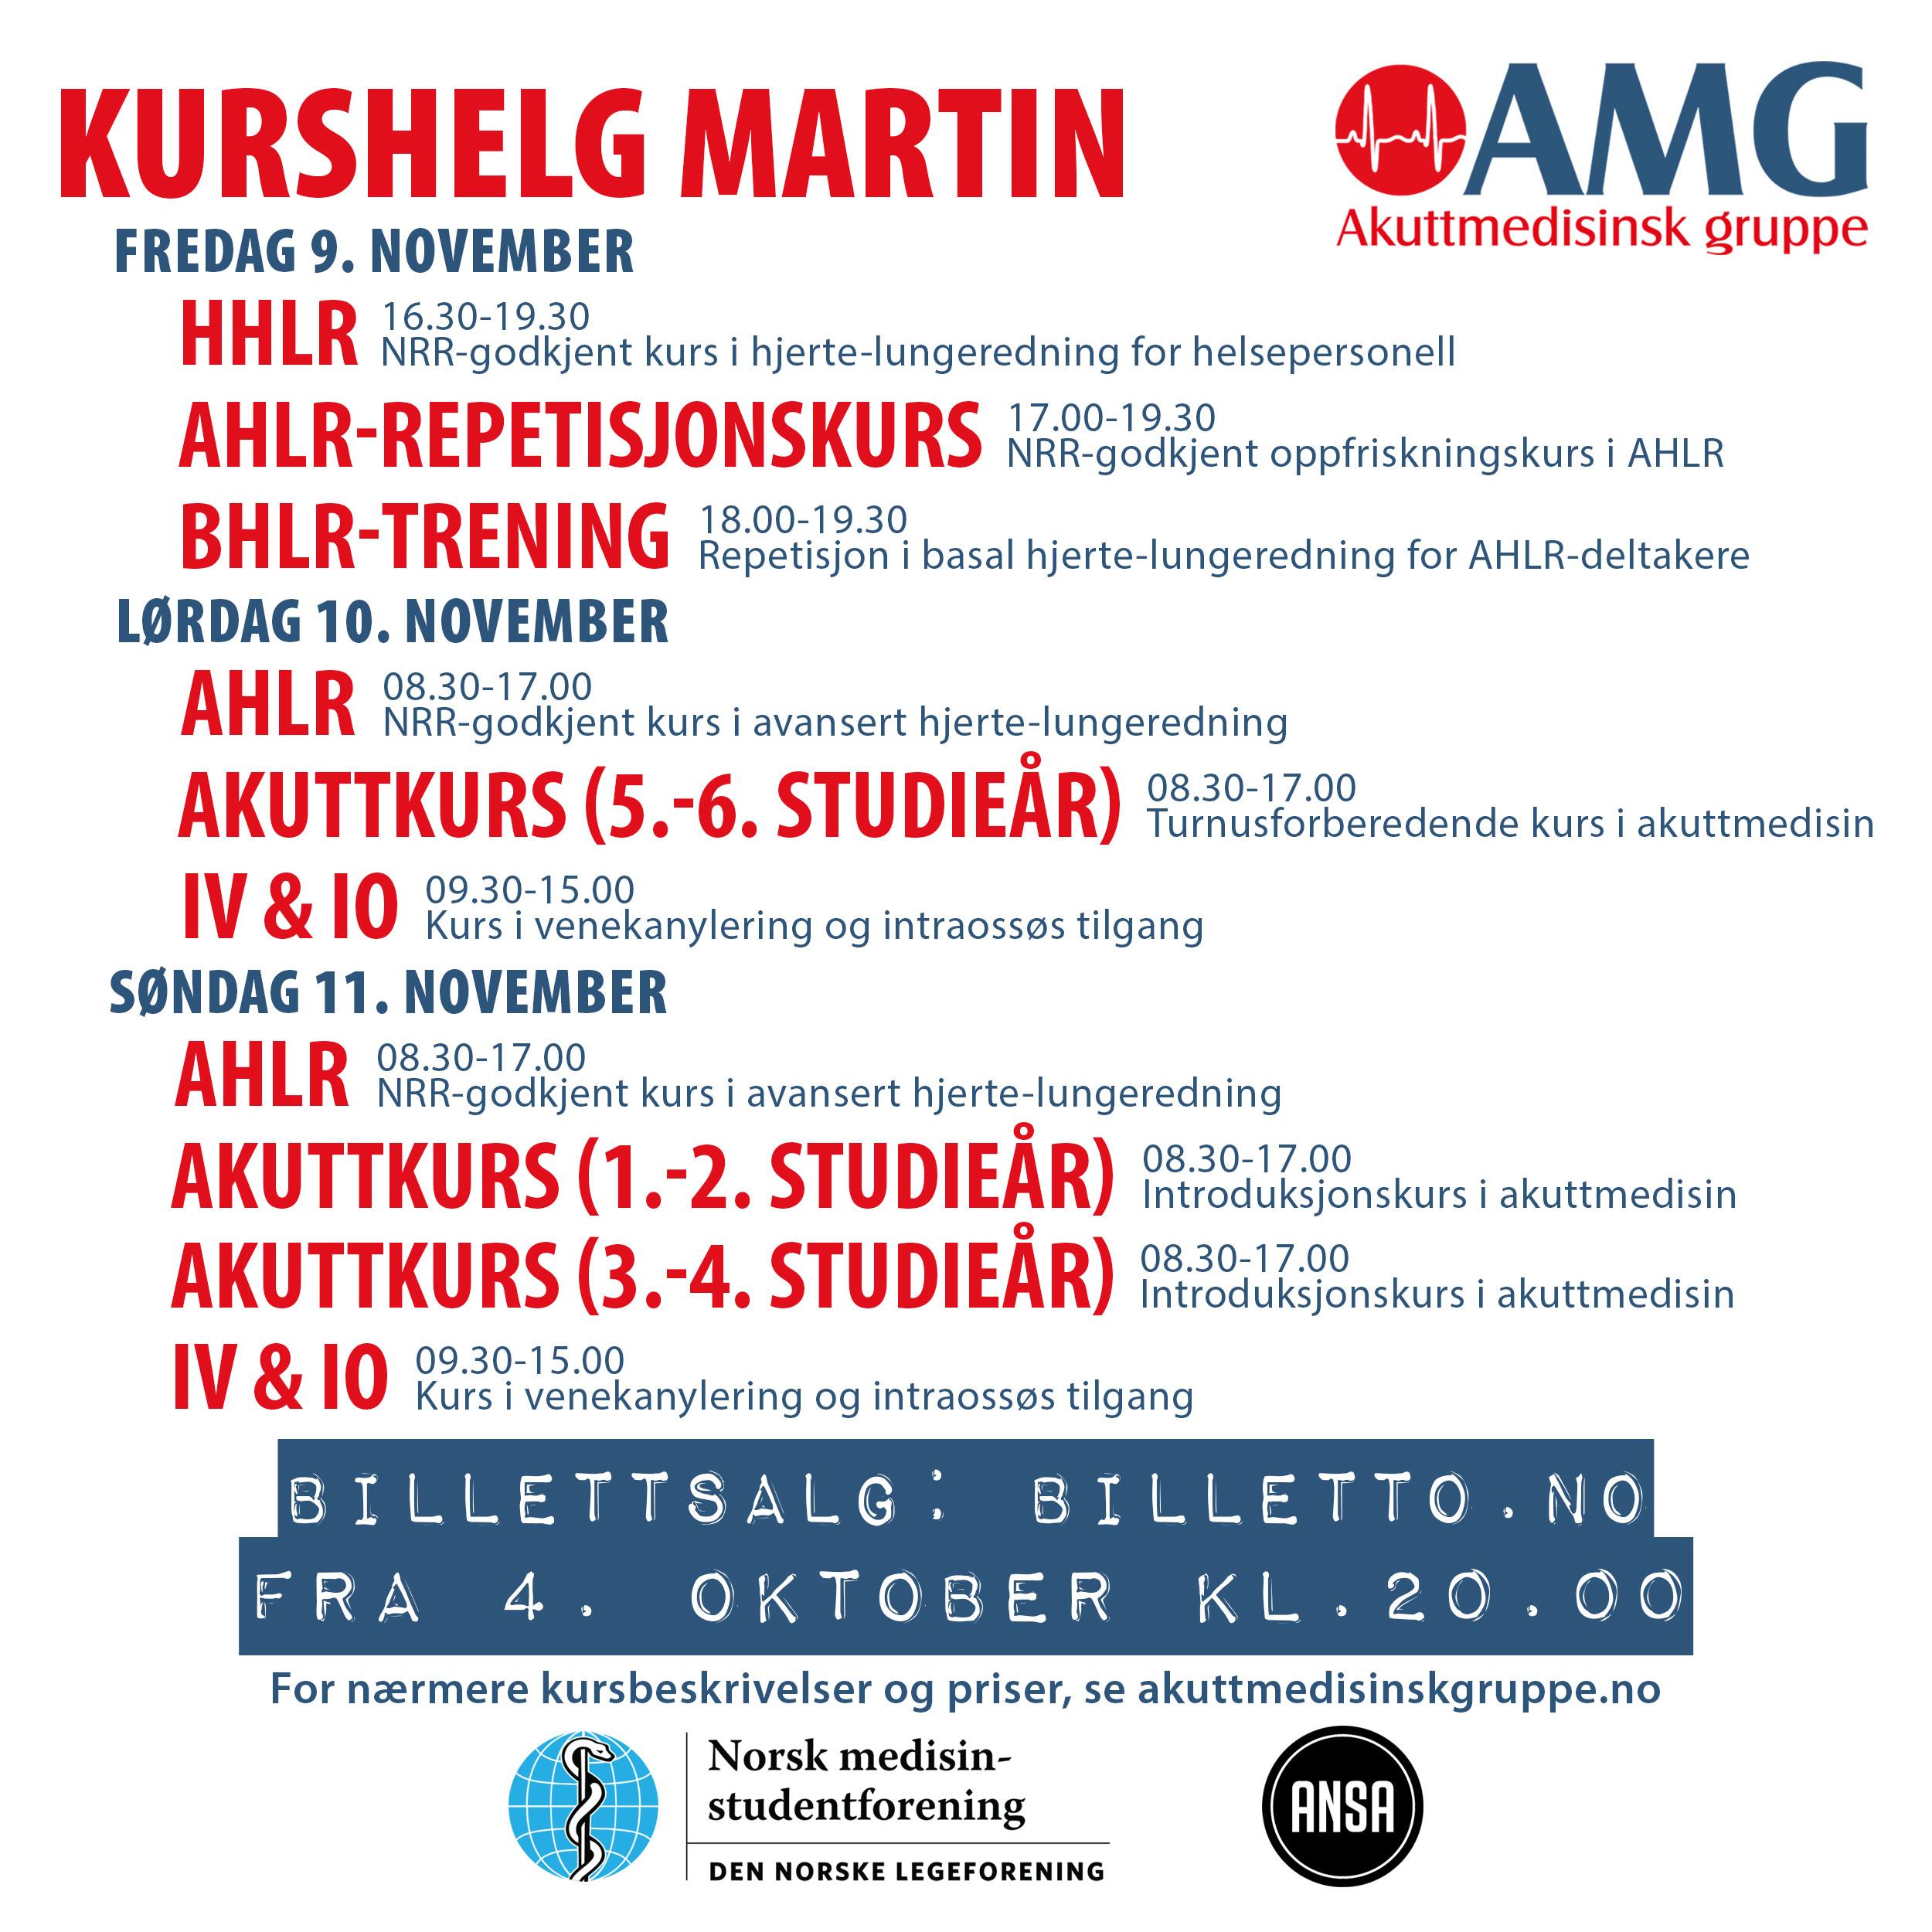 Kurshelg i Martin, 9.-11. november 2018